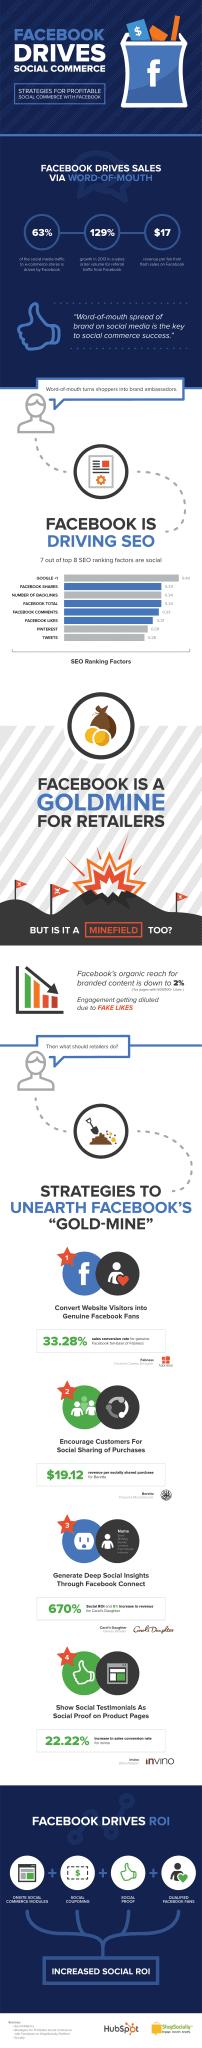 roi-positivo-ecommerce-facebook-infografia